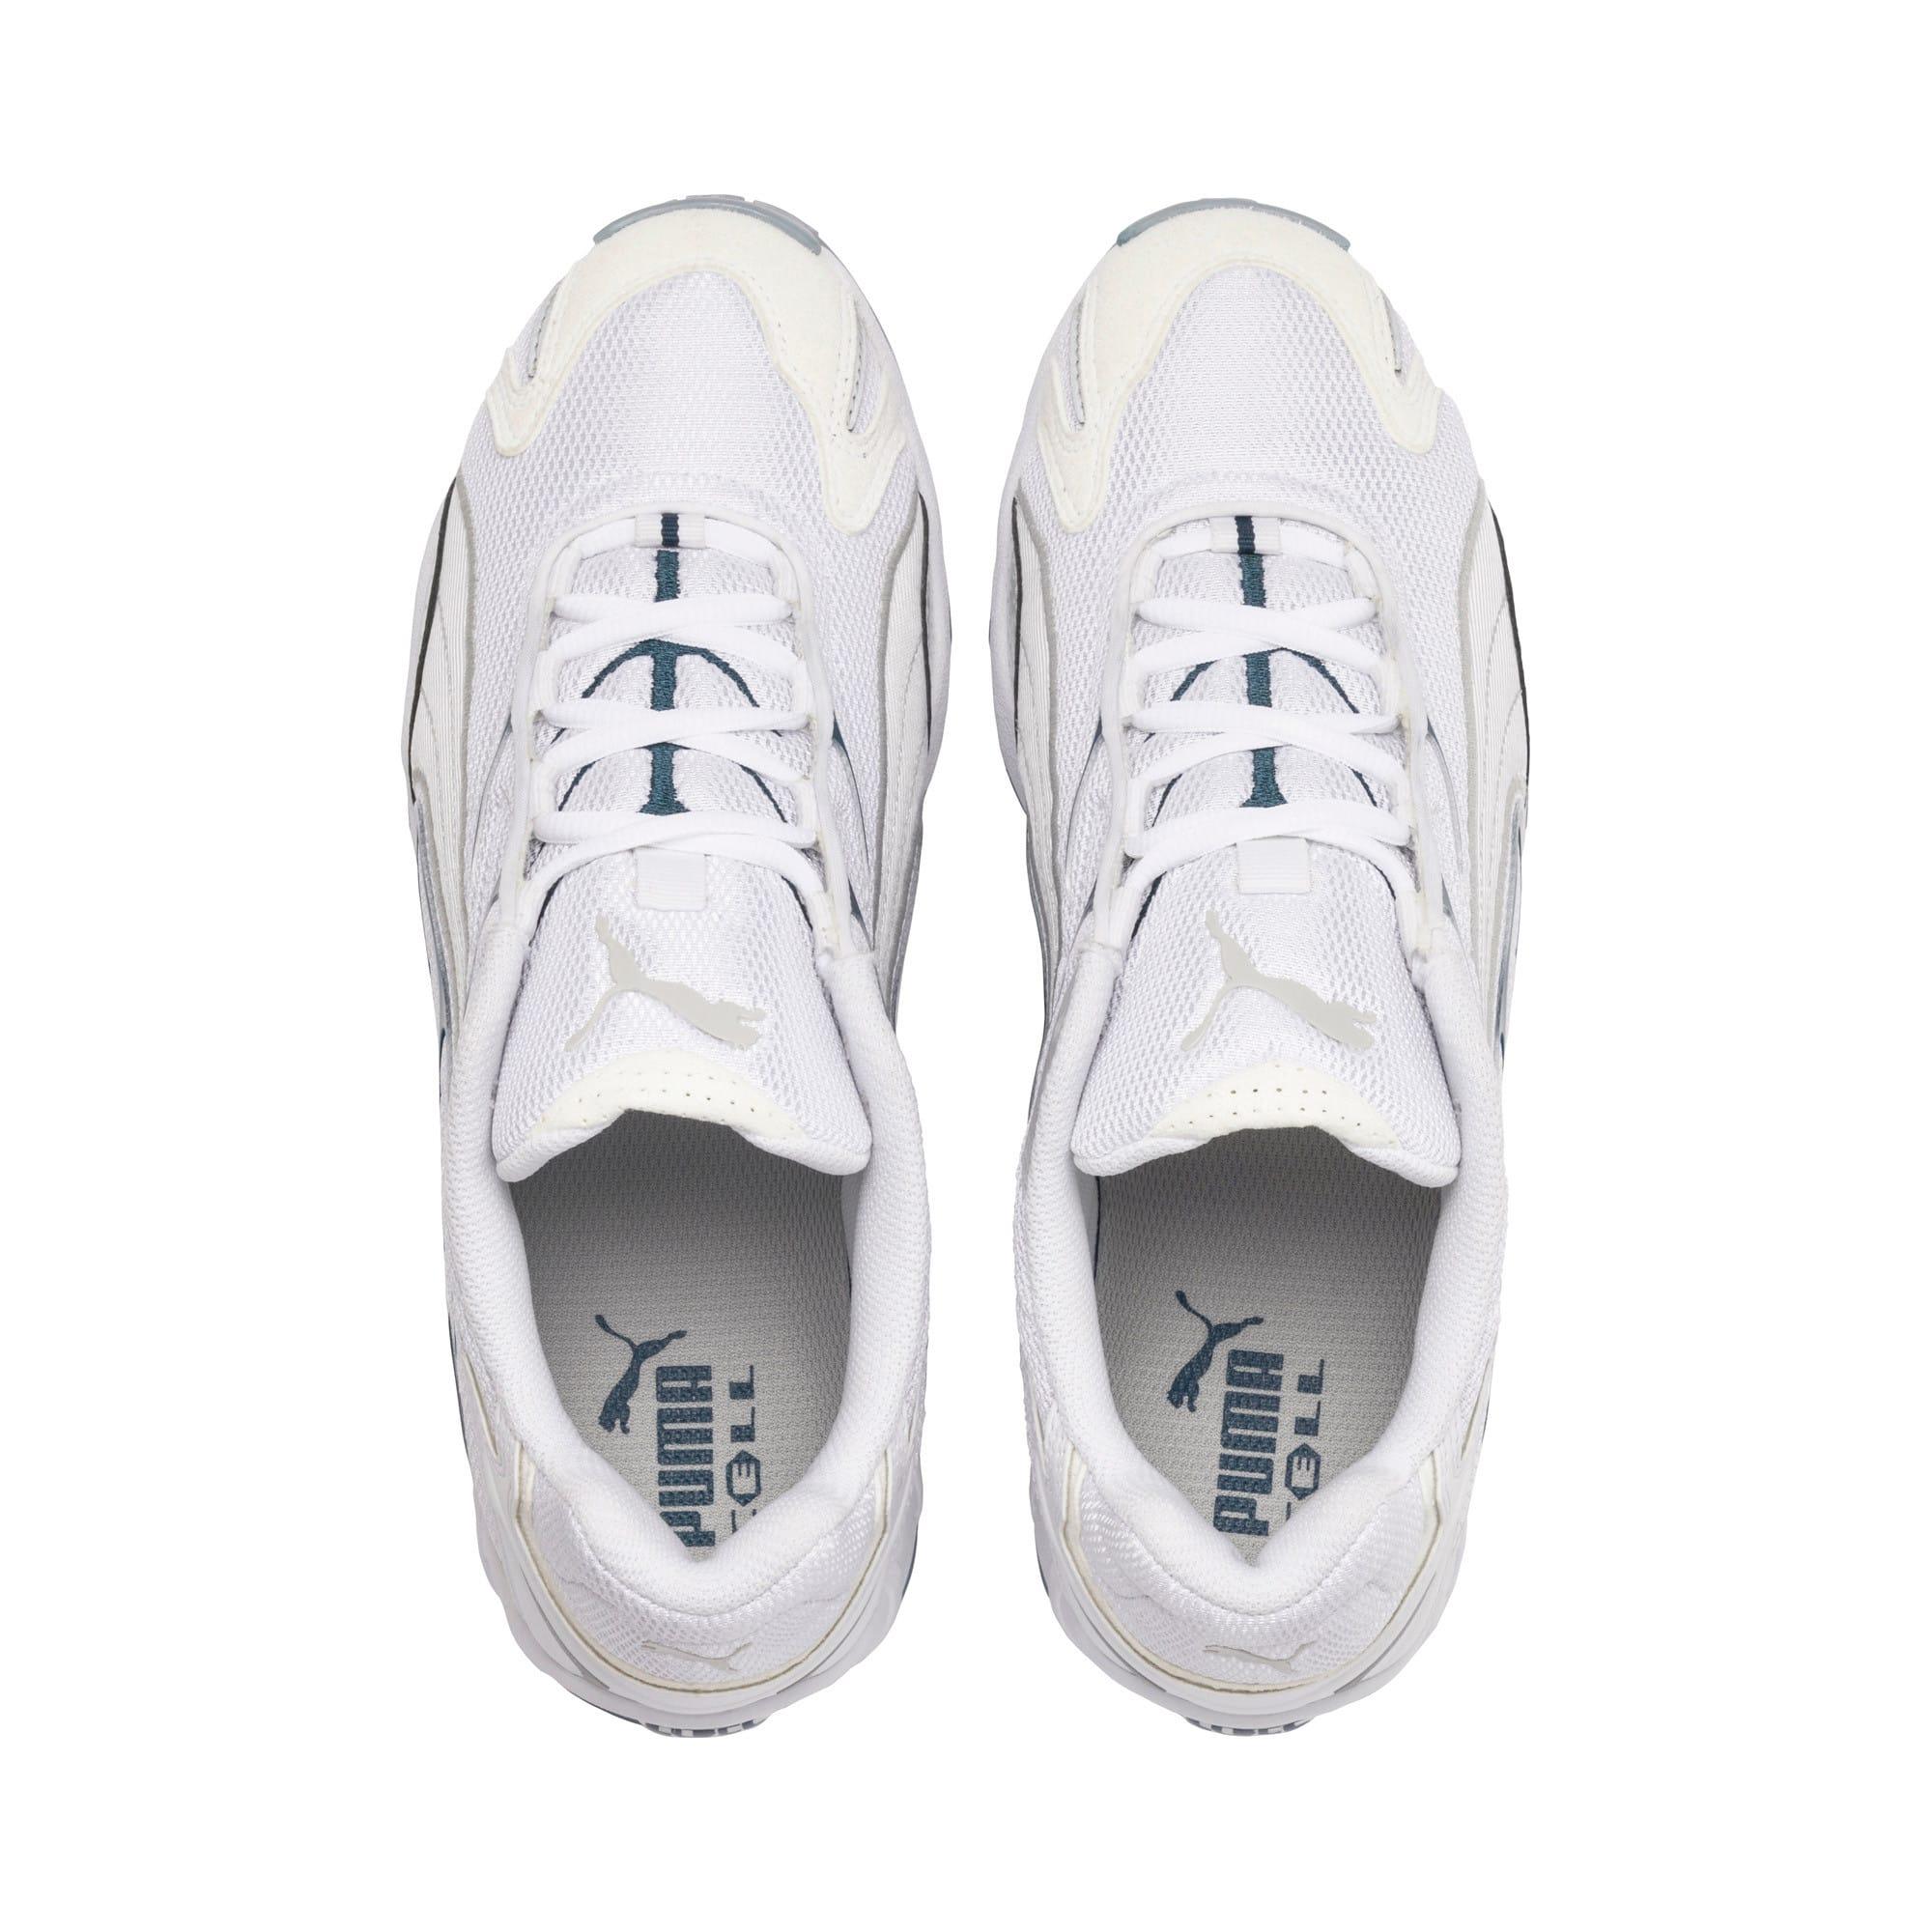 Thumbnail 7 of Inhale Sneakers, Puma White-Gray Violet, medium